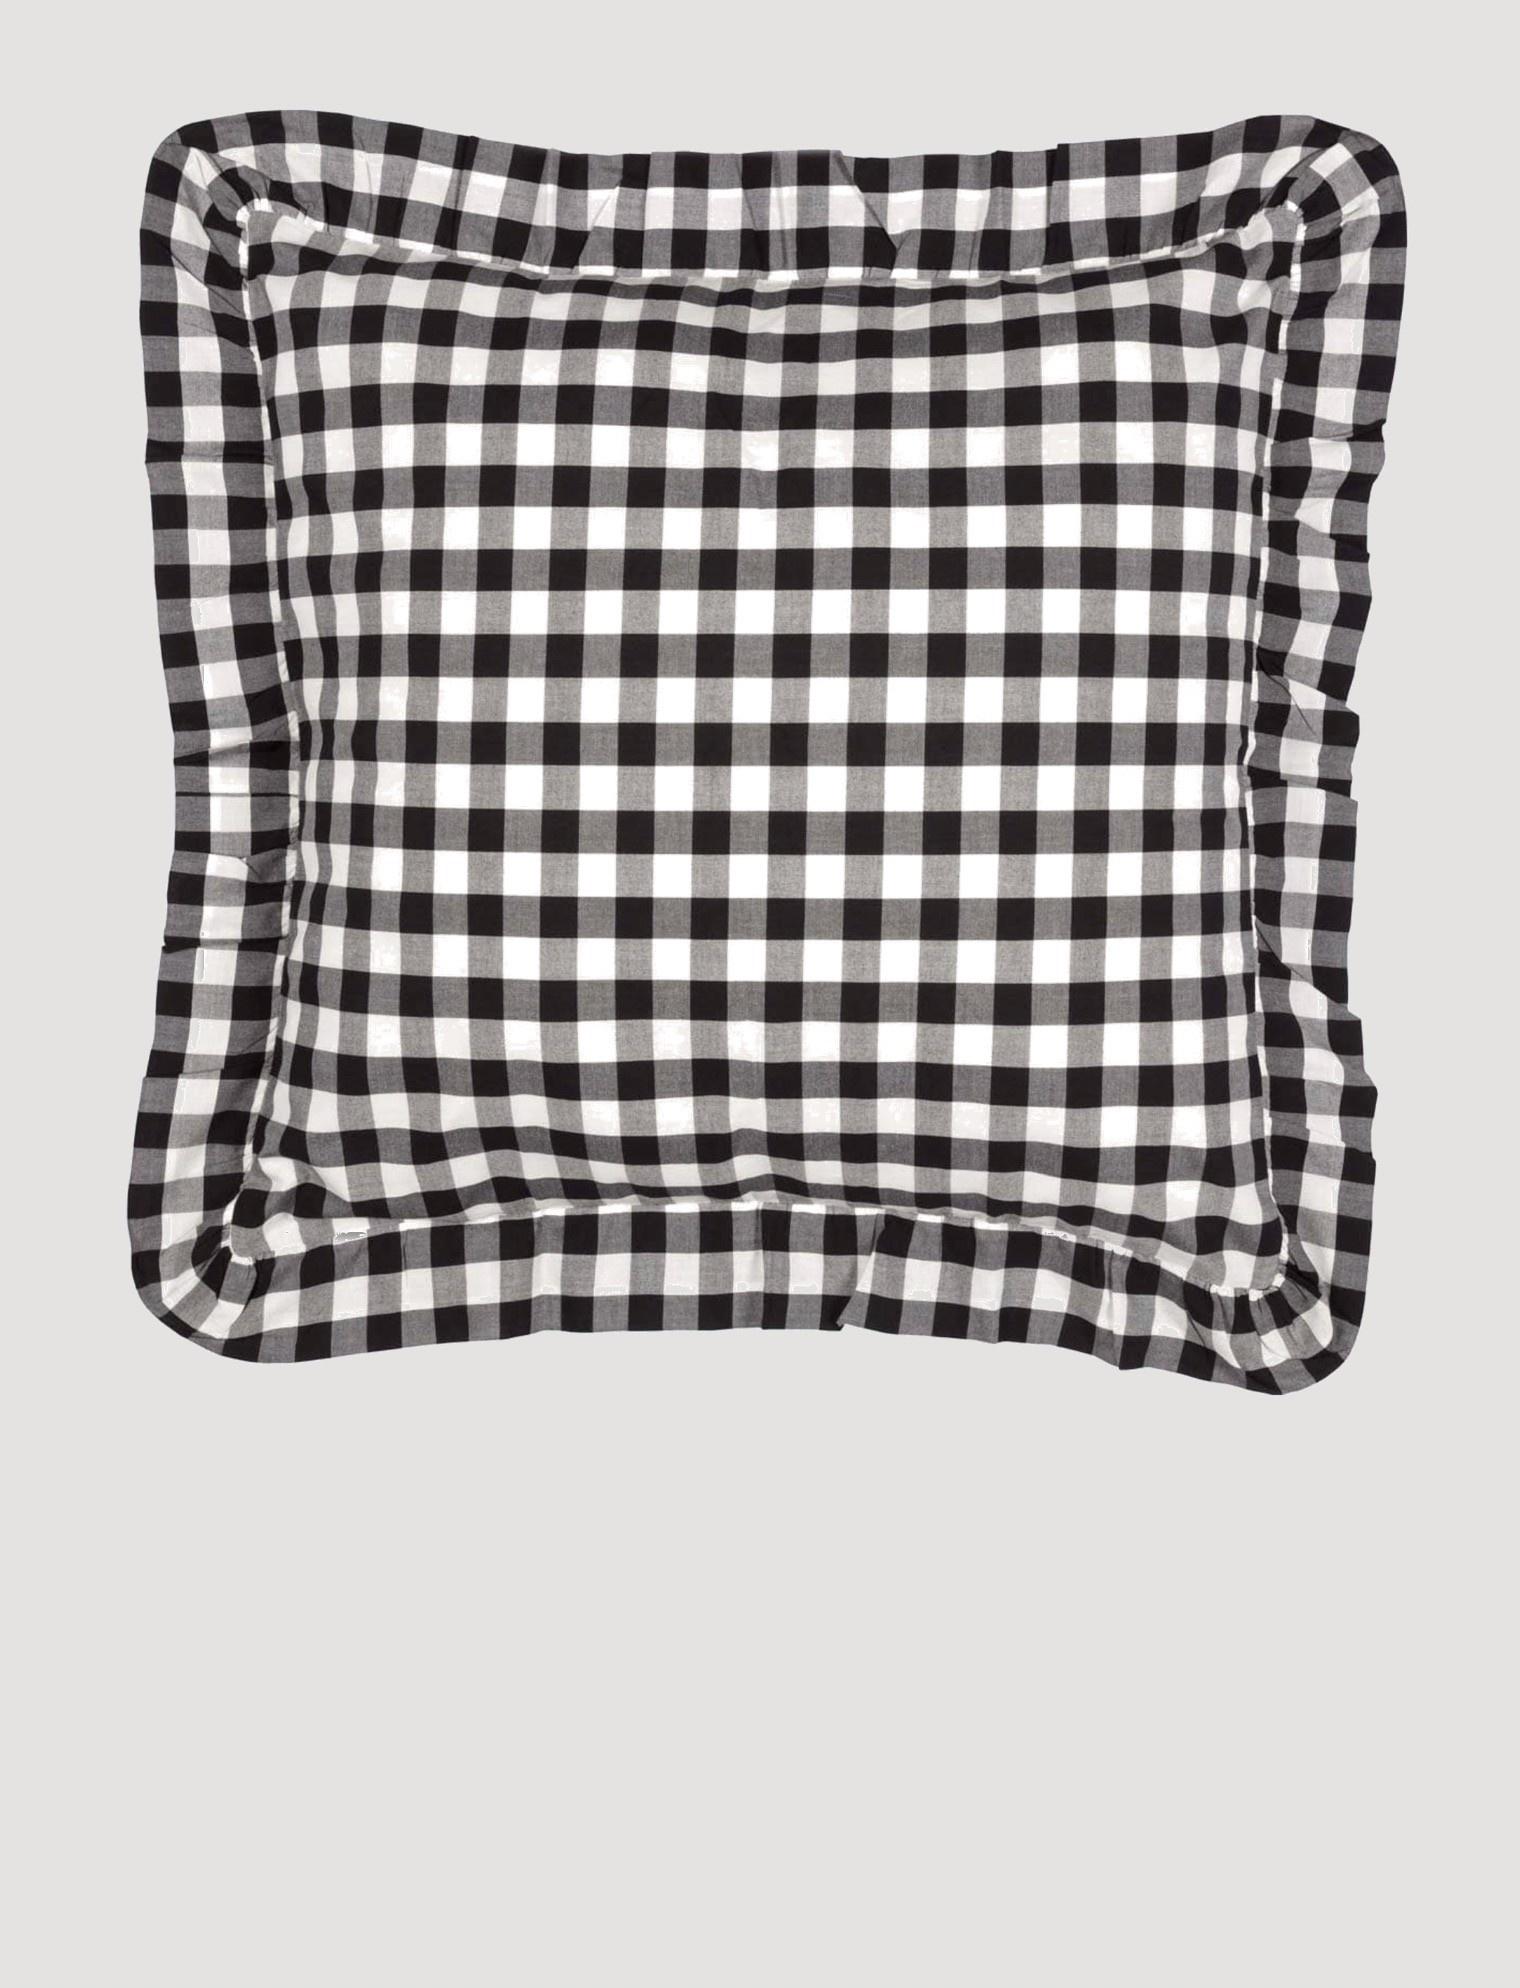 VHC Brands Annie Buffalo Black Check Pillow Fabric Euro Shams 26 x 26